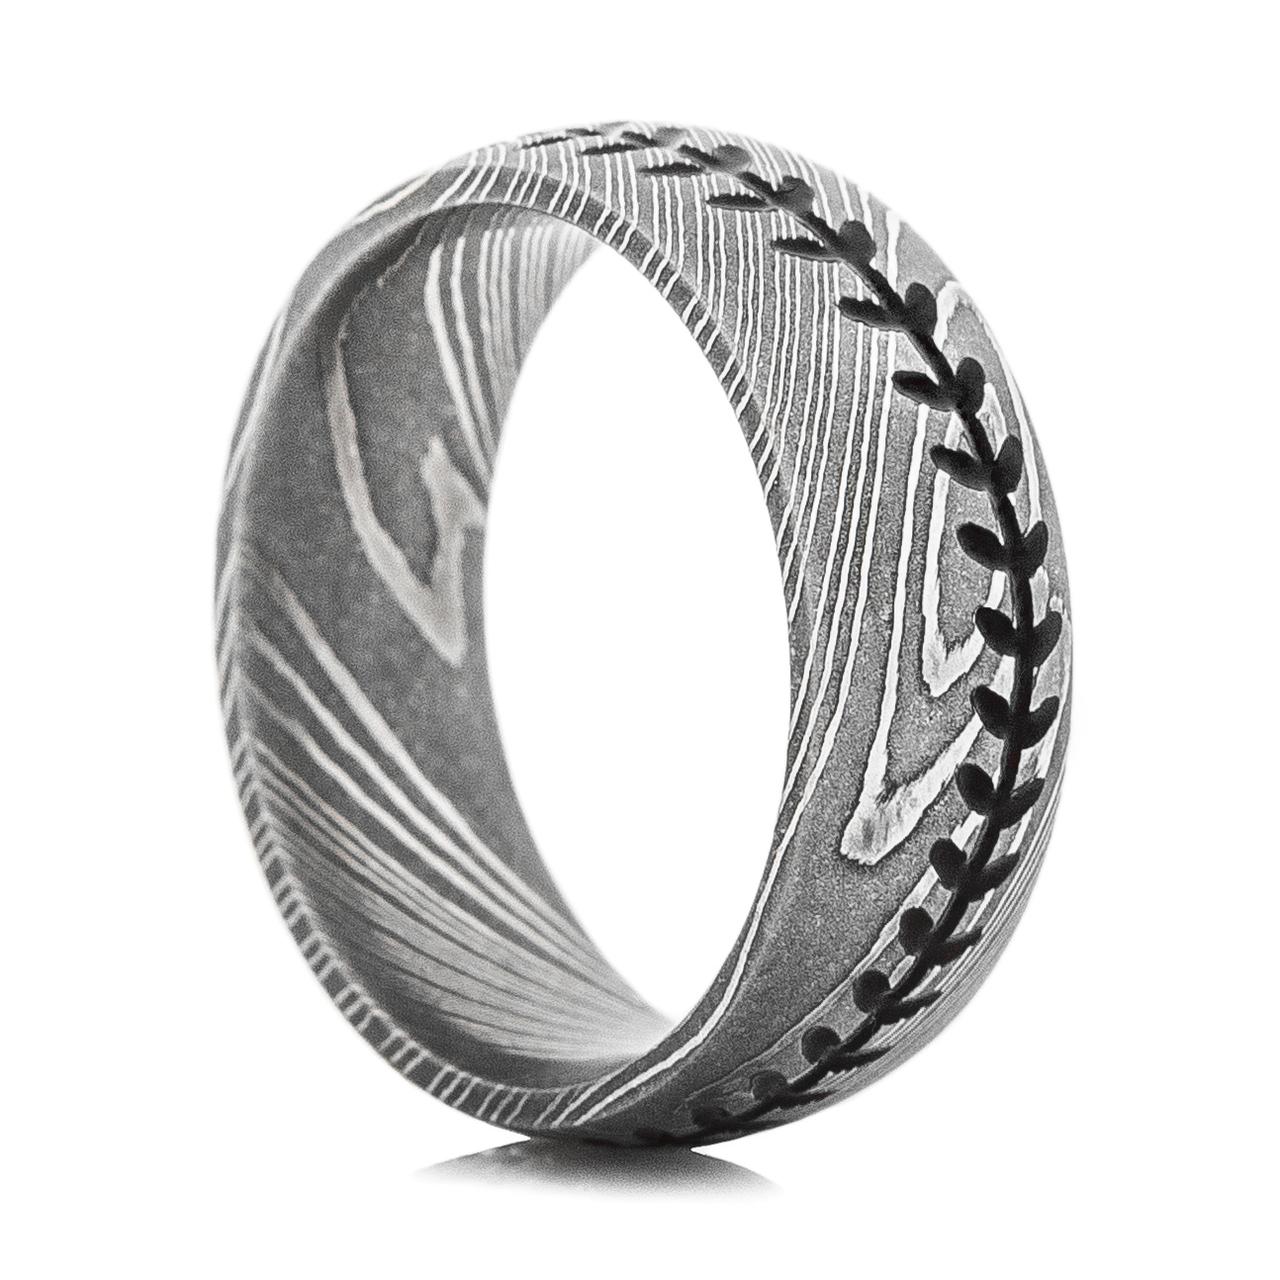 Stitch Ring · Men's Damascus Steel Baseball Stitch